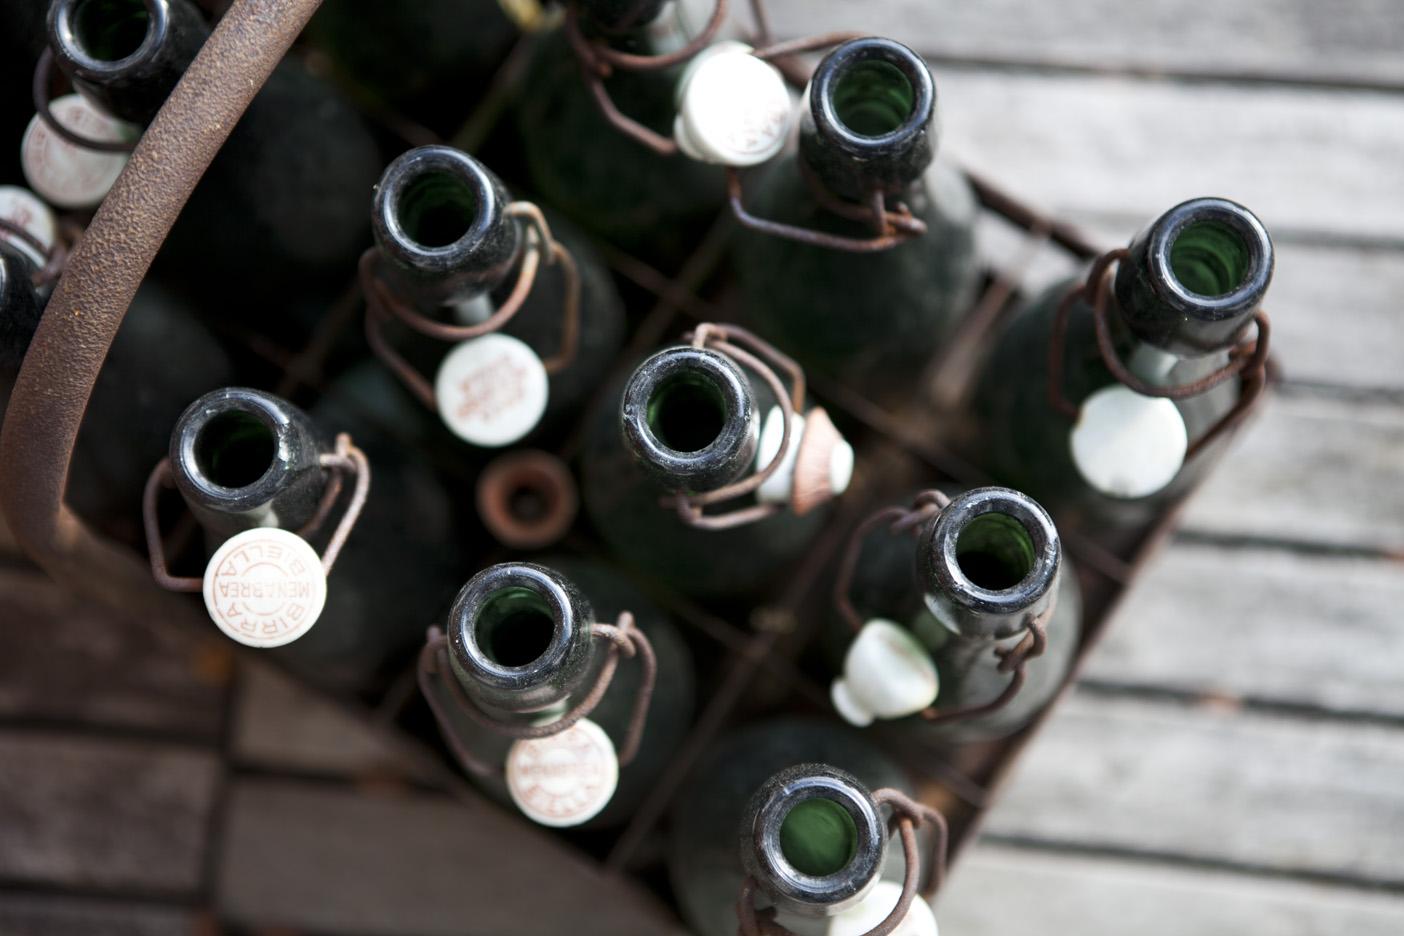 enrico picasso bottiglie